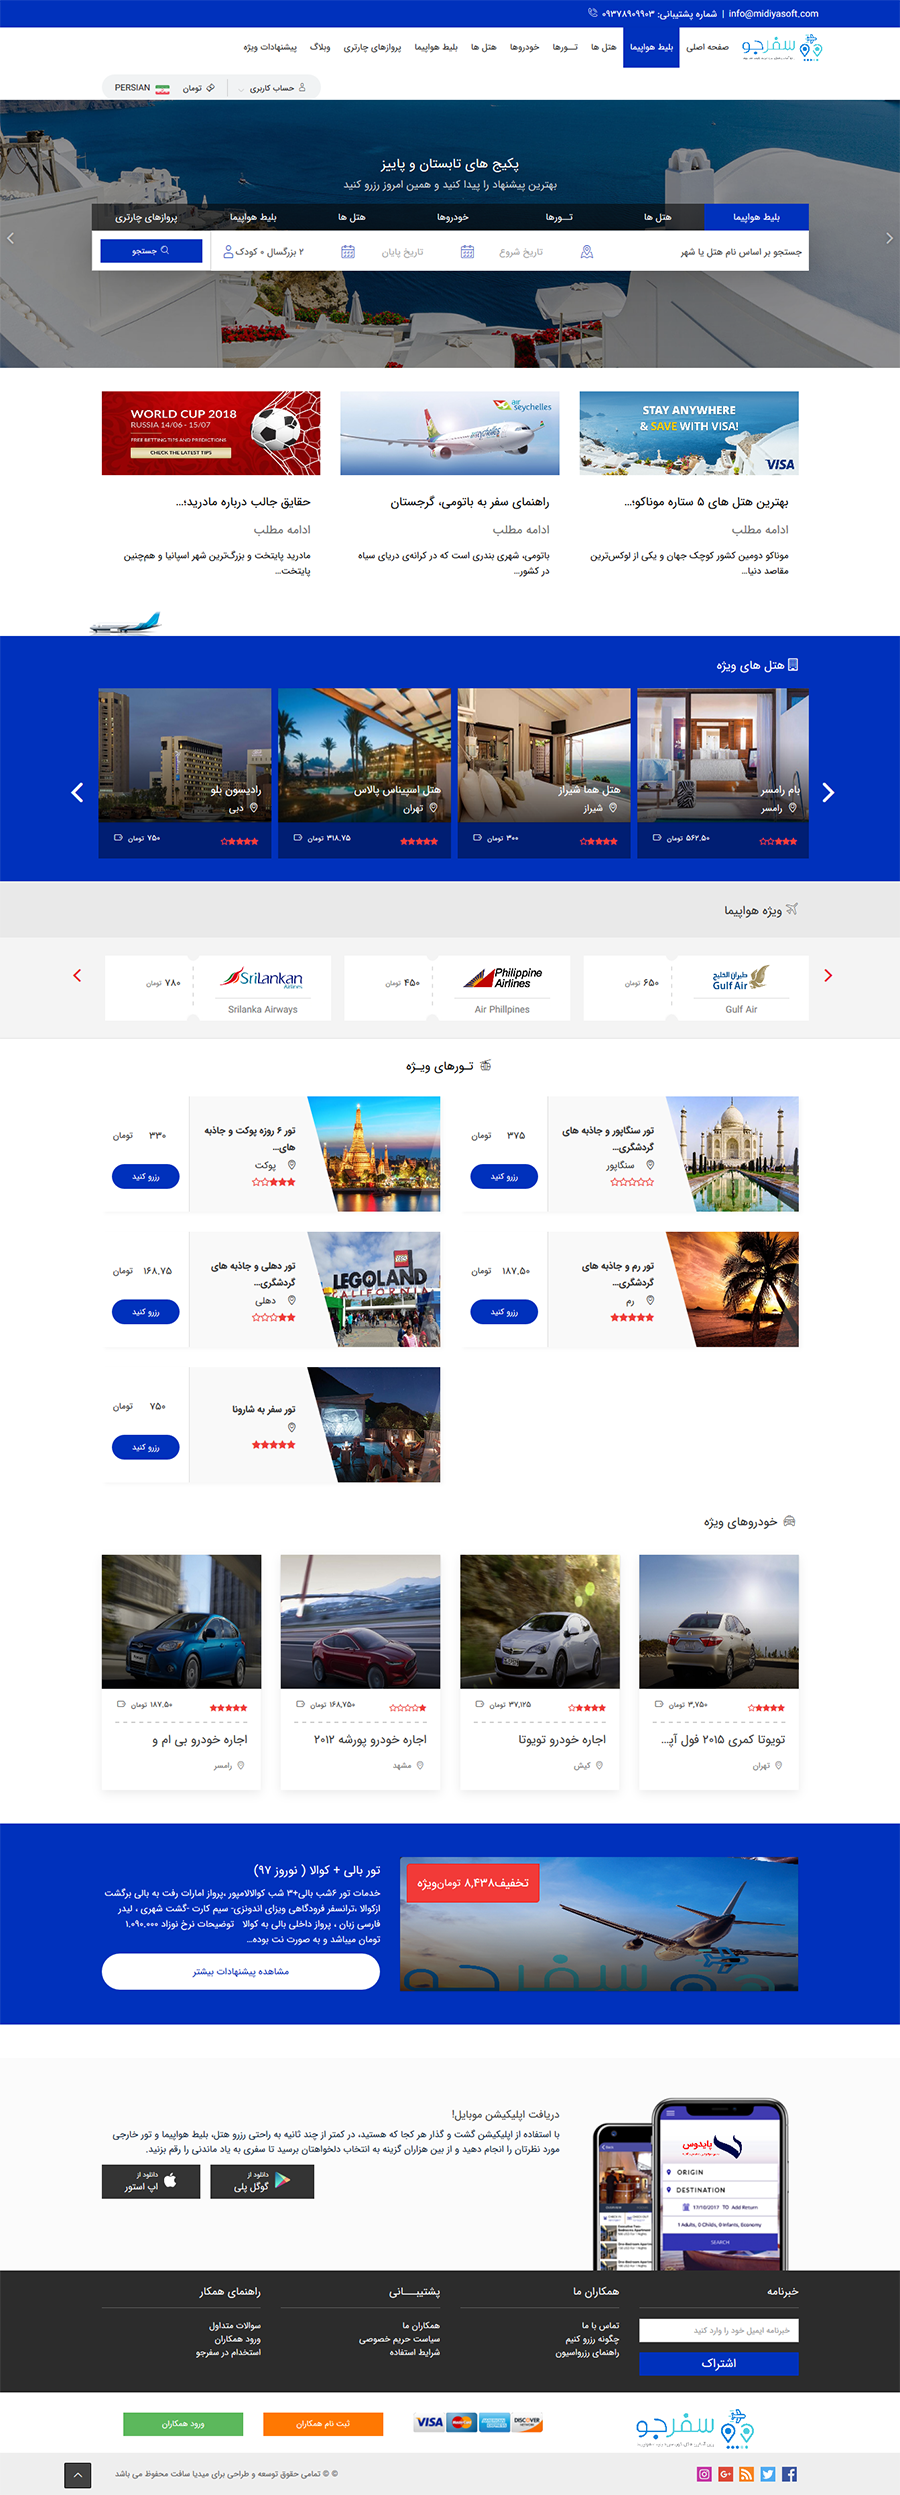 phptravels - قالب پیشفرض فارسی اسکریپت phptravels